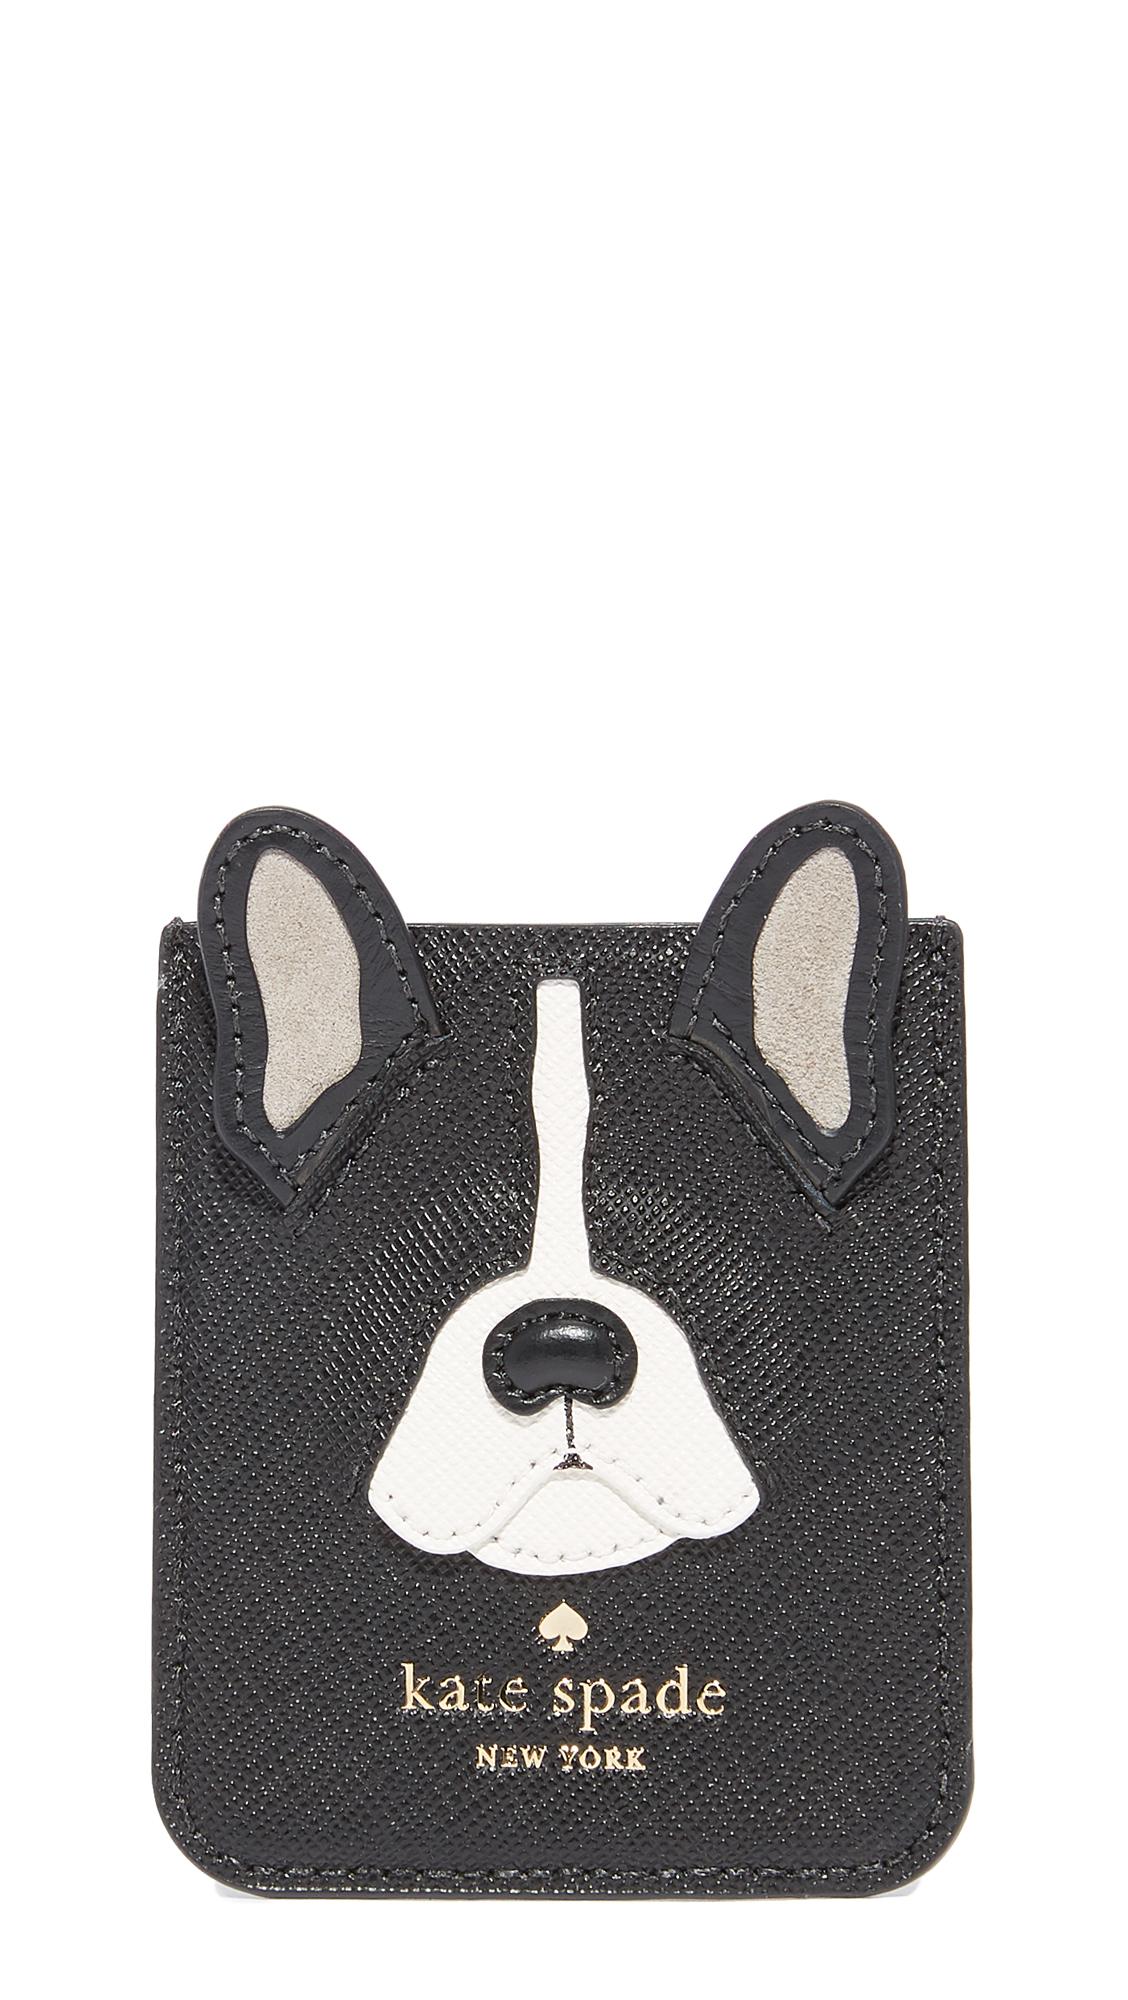 Antoine Applique Adhesive Phone Pocket in Black Multi